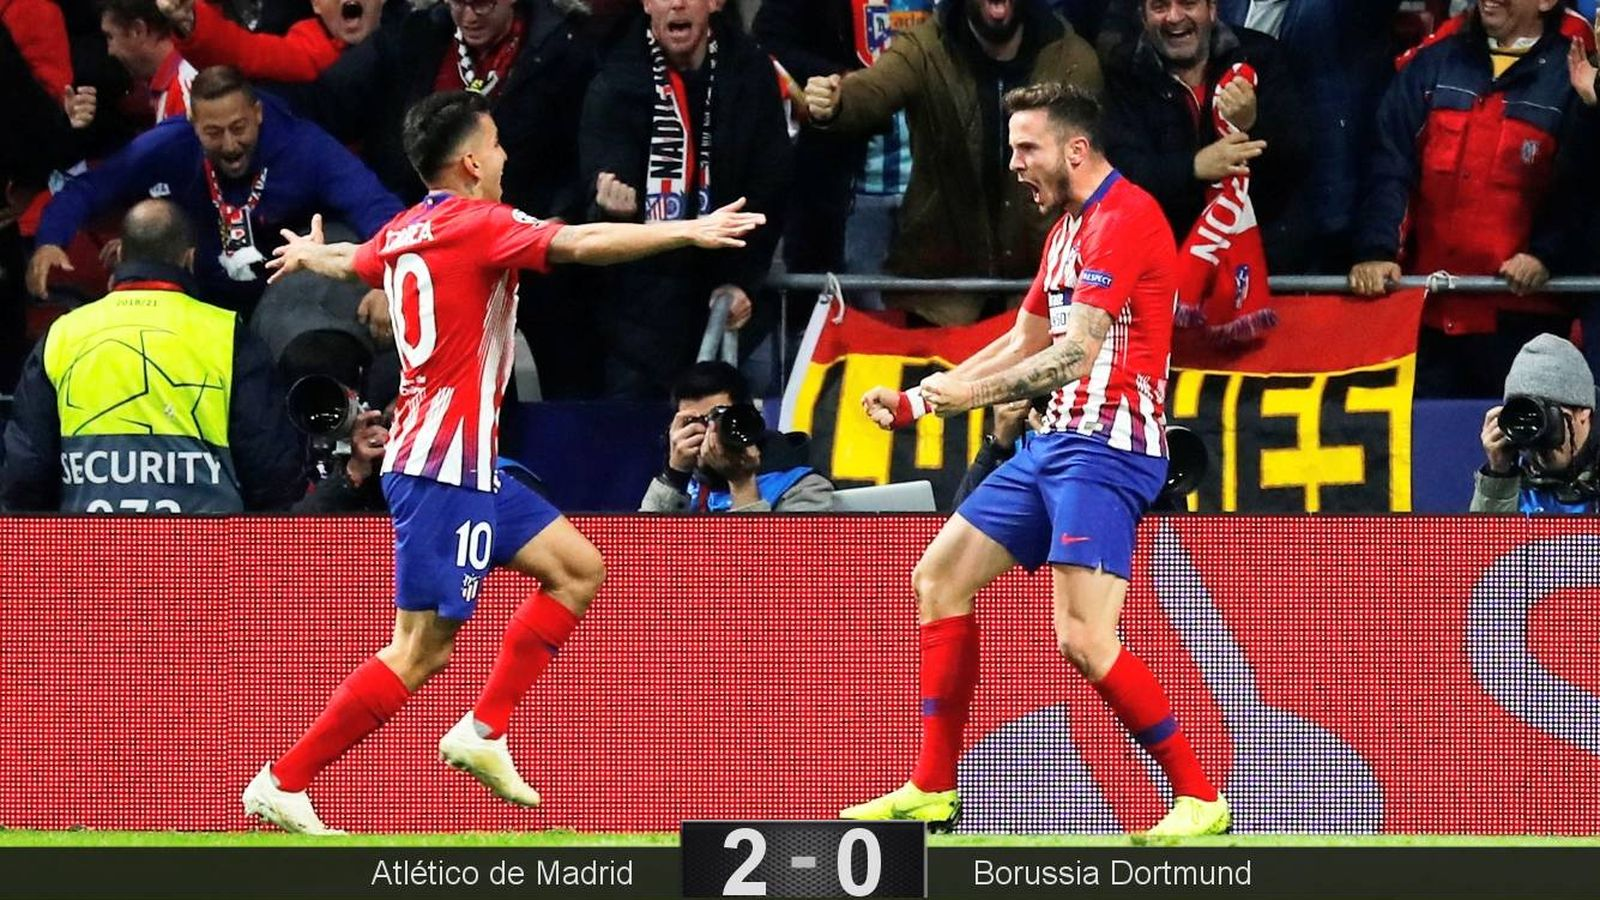 Foto: Saúl marcó el primer gol del Atlético en la victoria ante el Borussia Dortmund. (Reuters)